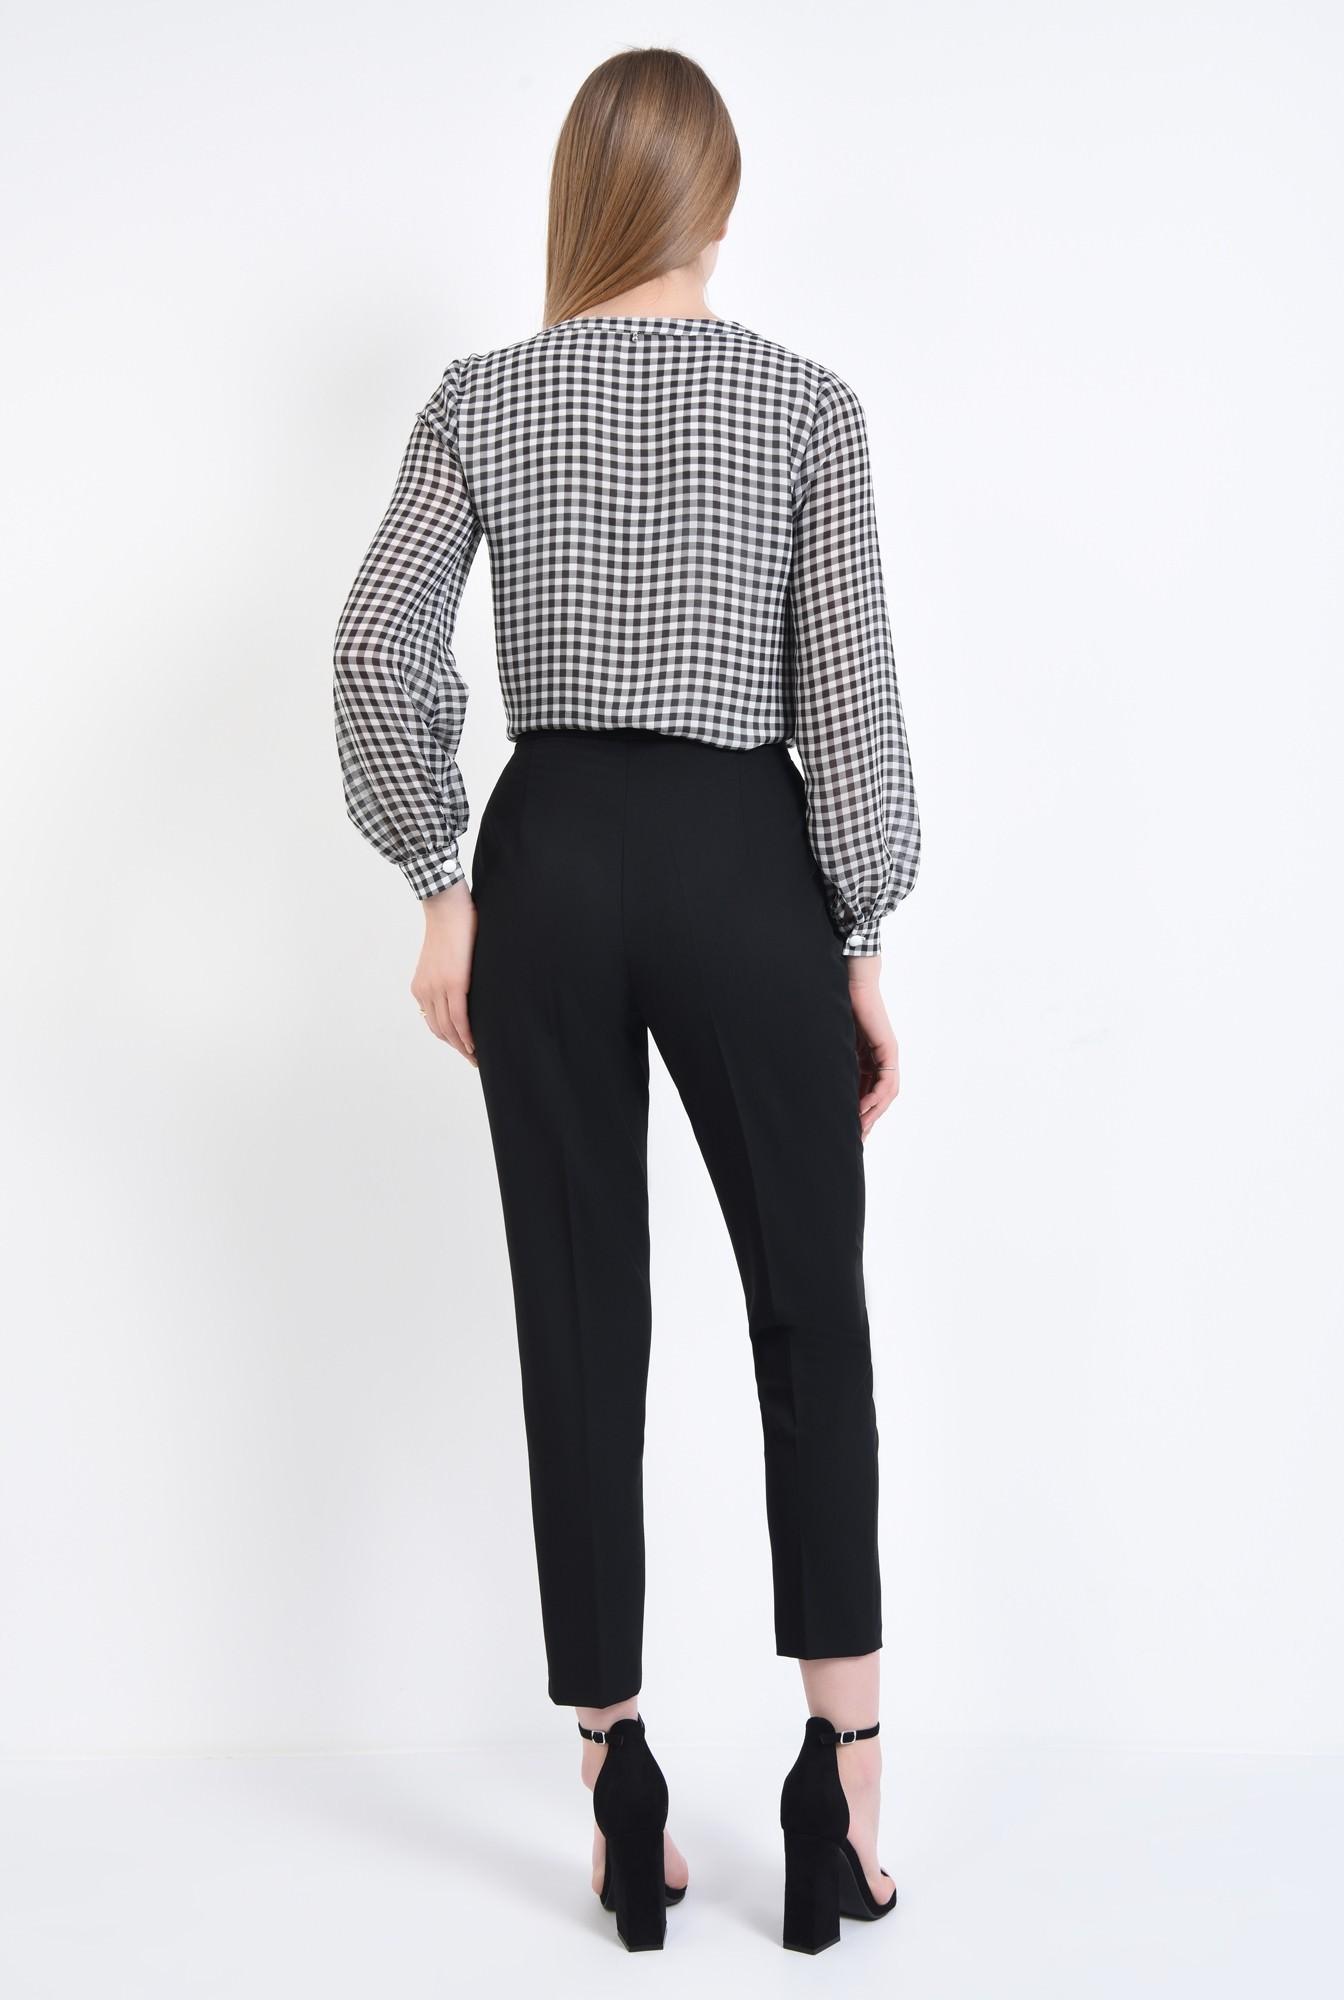 1 - Bluza casual, contrast, alb-negru